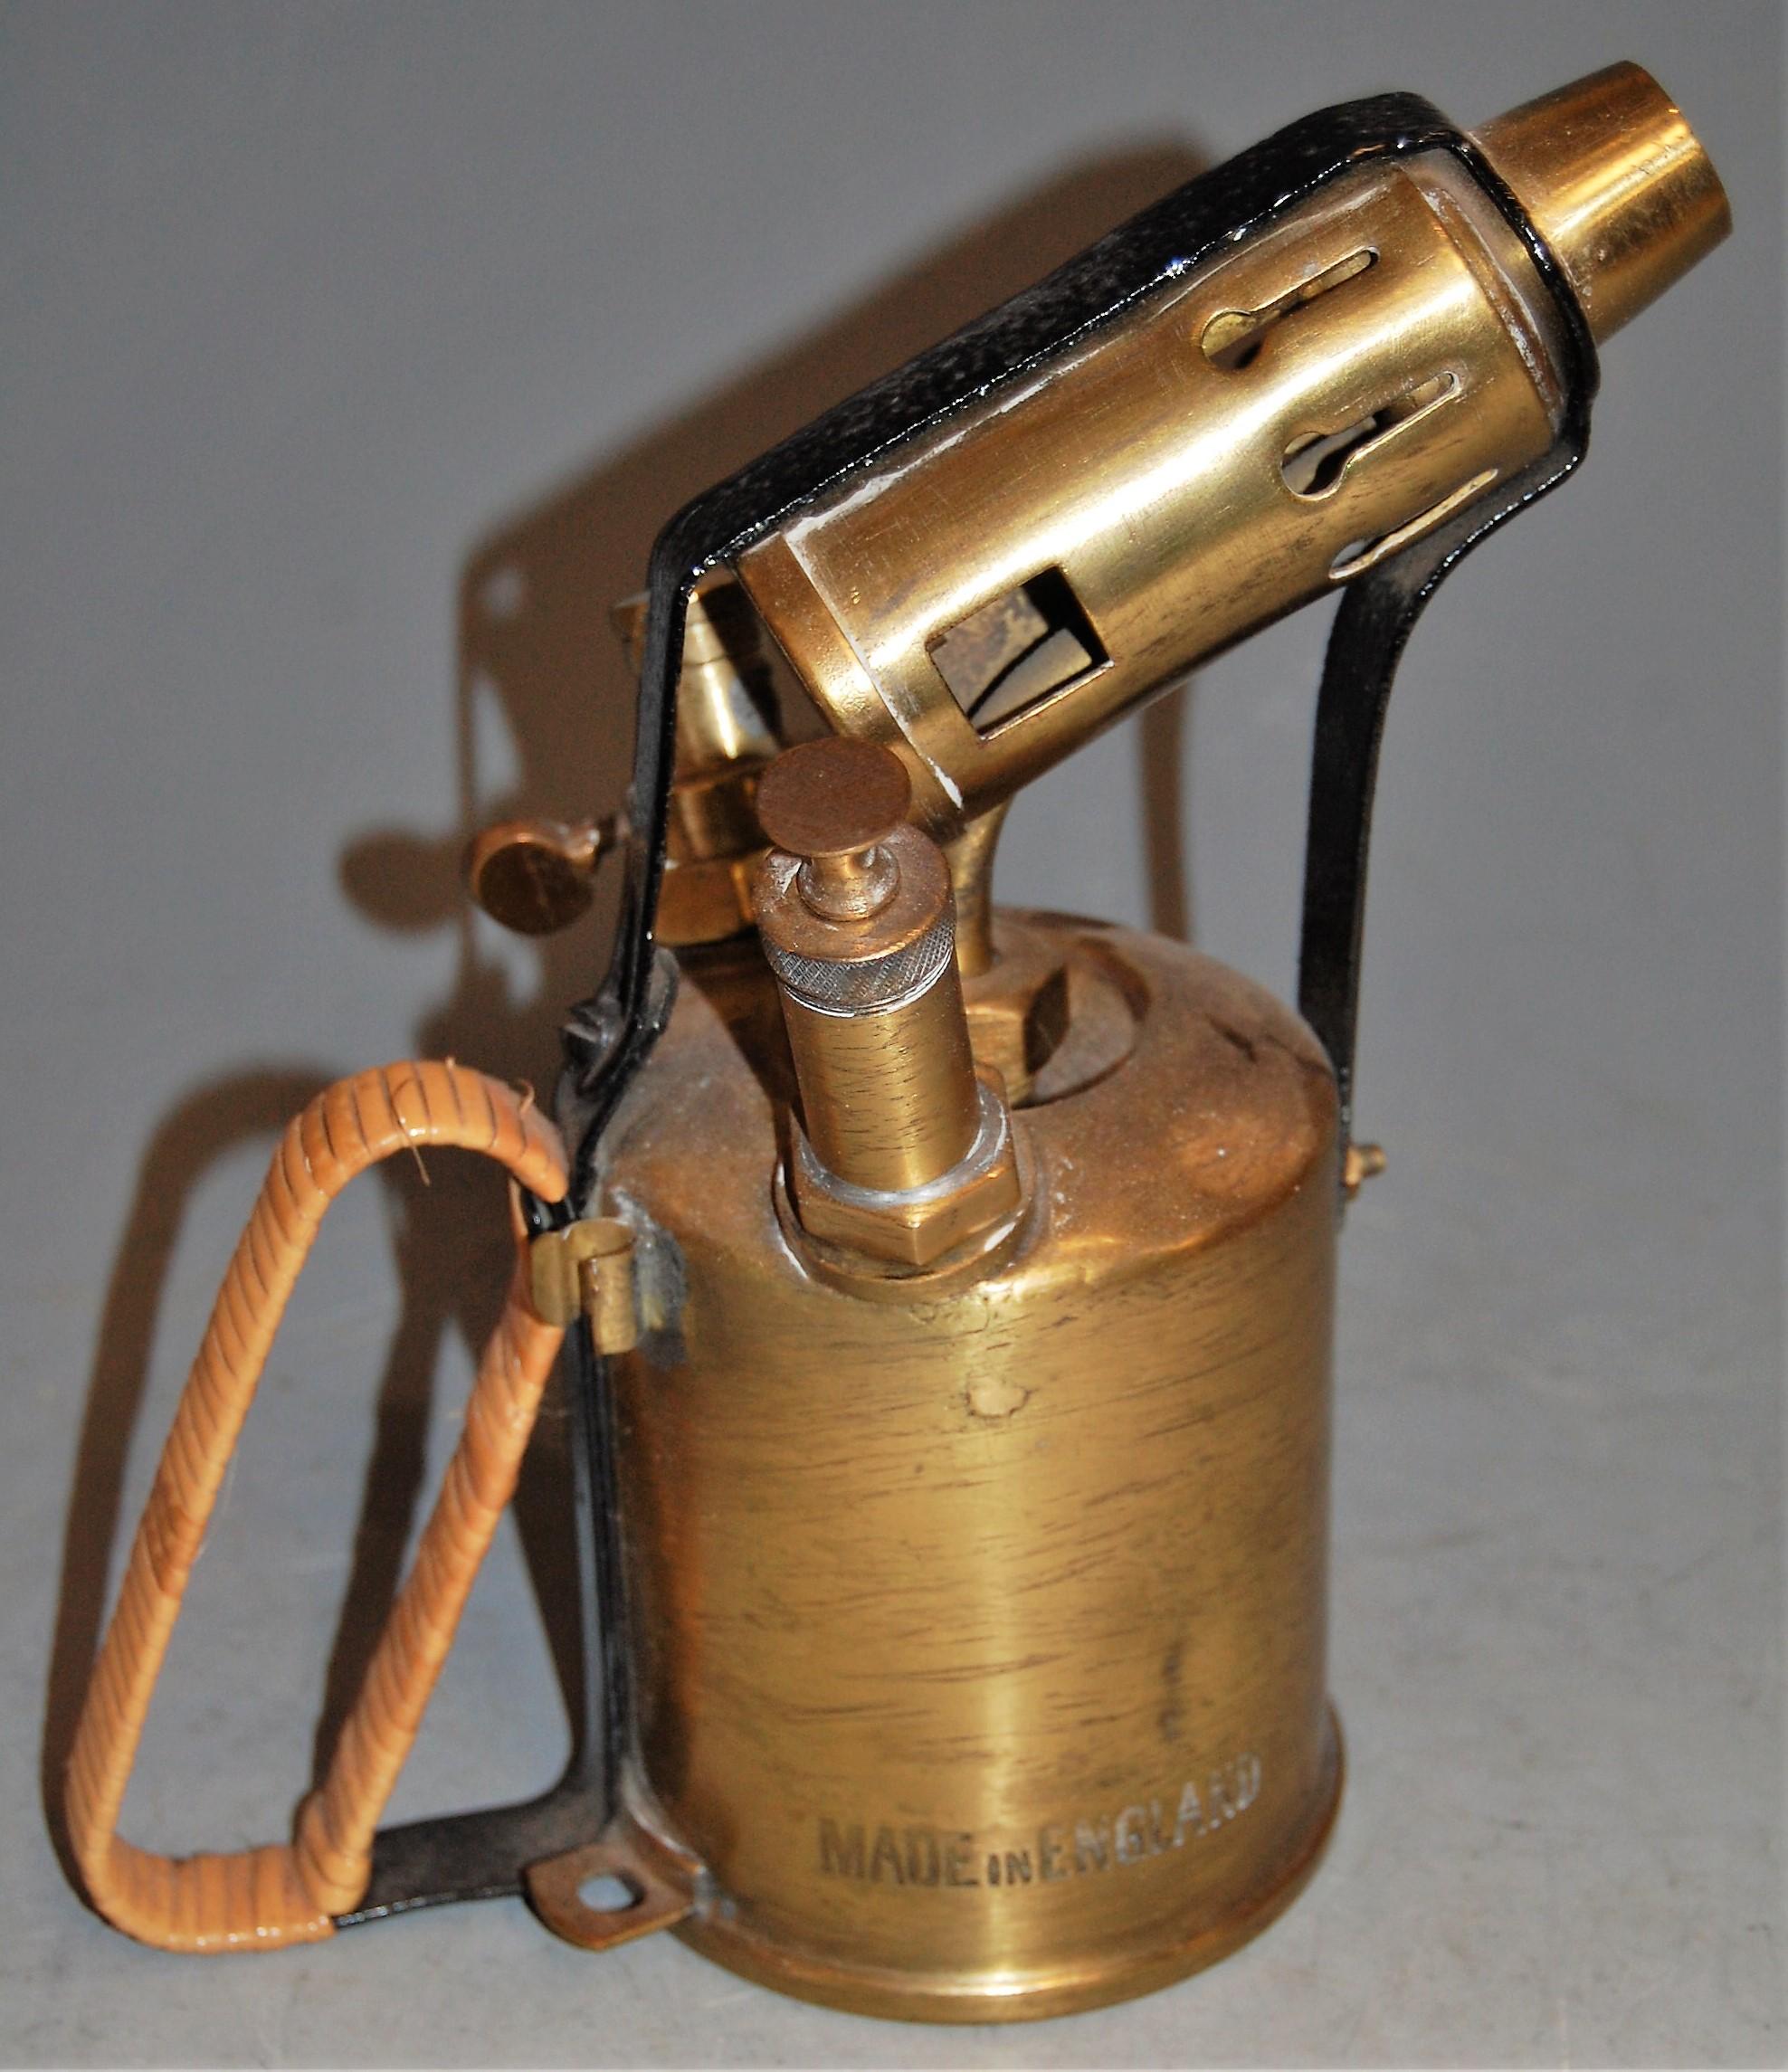 Lot 46 - A Corona brass paraffin blow lamp, No.107